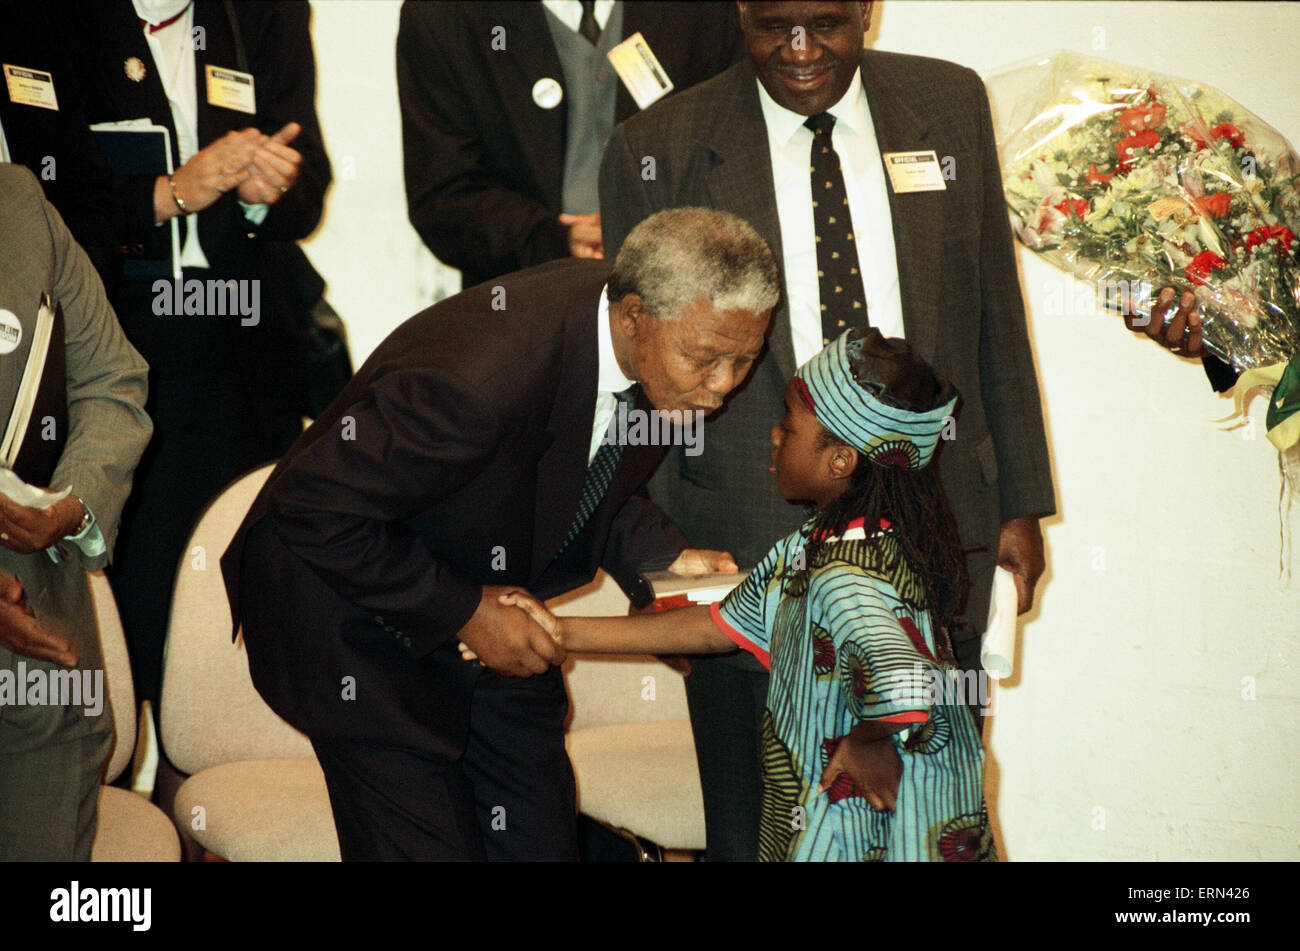 Nelson Mandela at the Hansdworth Leisure Centre in Handsworth, Birmingham, 11th October 1993. - Stock Image